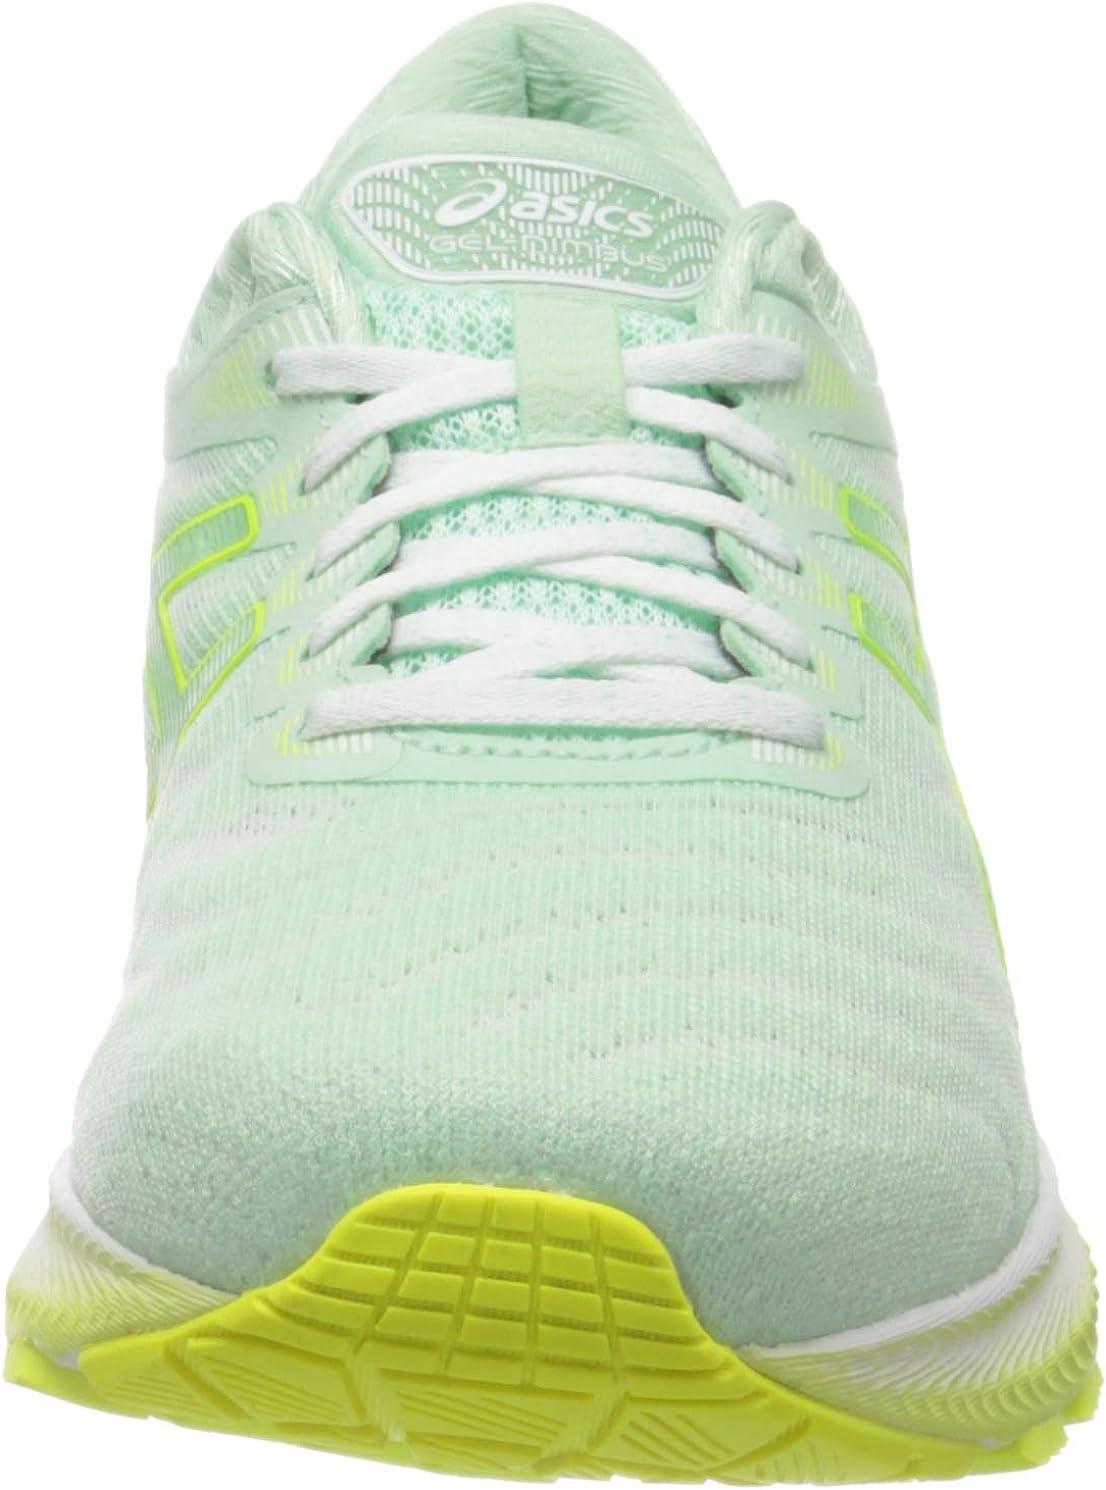 ASICS Gel-Nimbus 22 Zapatilla de Correr para Mujer